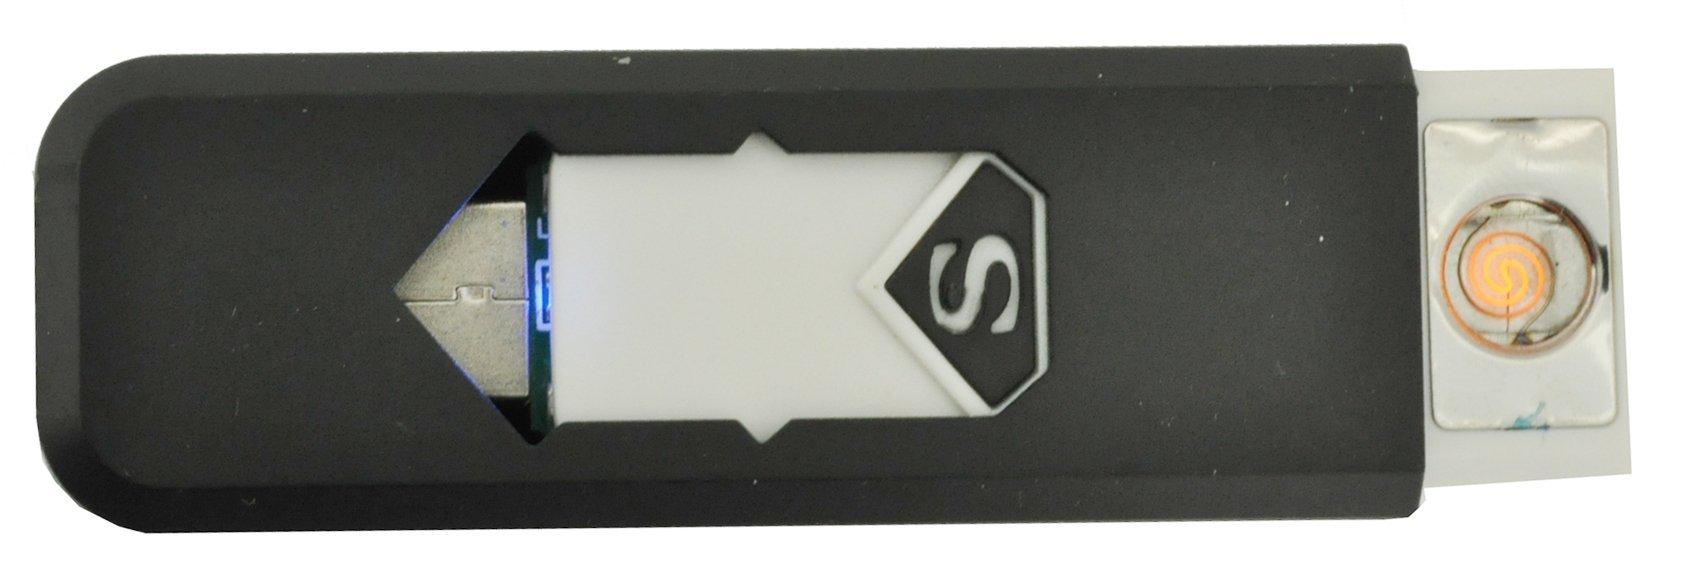 Superman Flameless Pilot Cigarette Lighter, Rechargeable Electronic Flameless USB Lighter (Black)